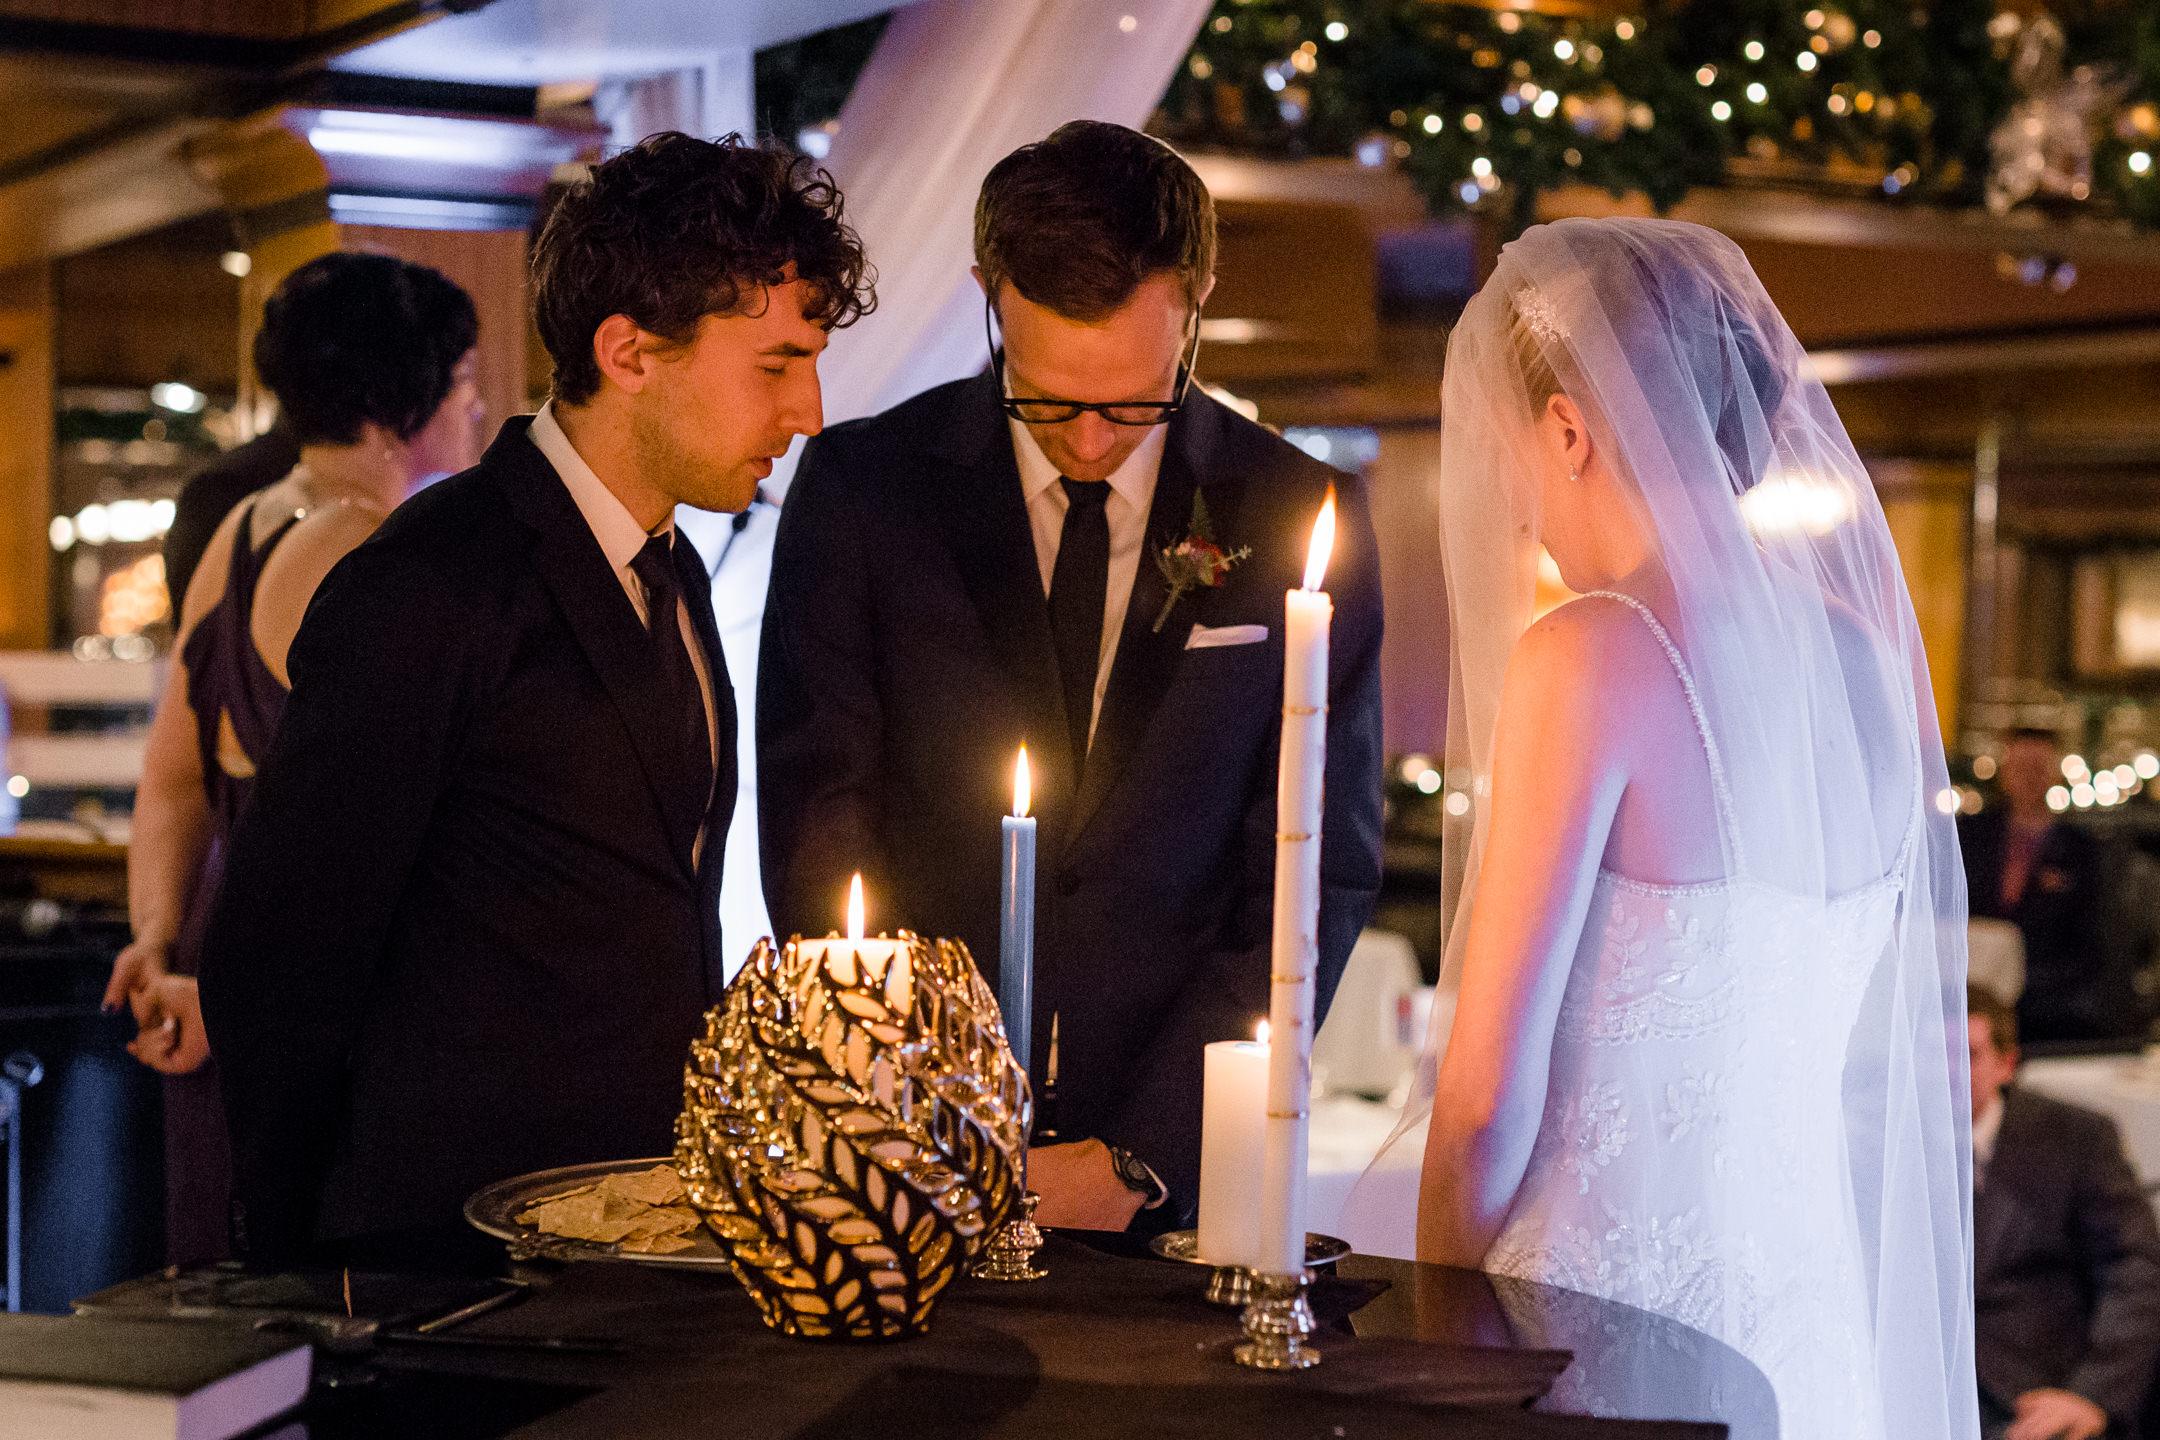 Documentary-Wedding-Photography-Andrew-Tat-Gabi & Kim-17.jpg